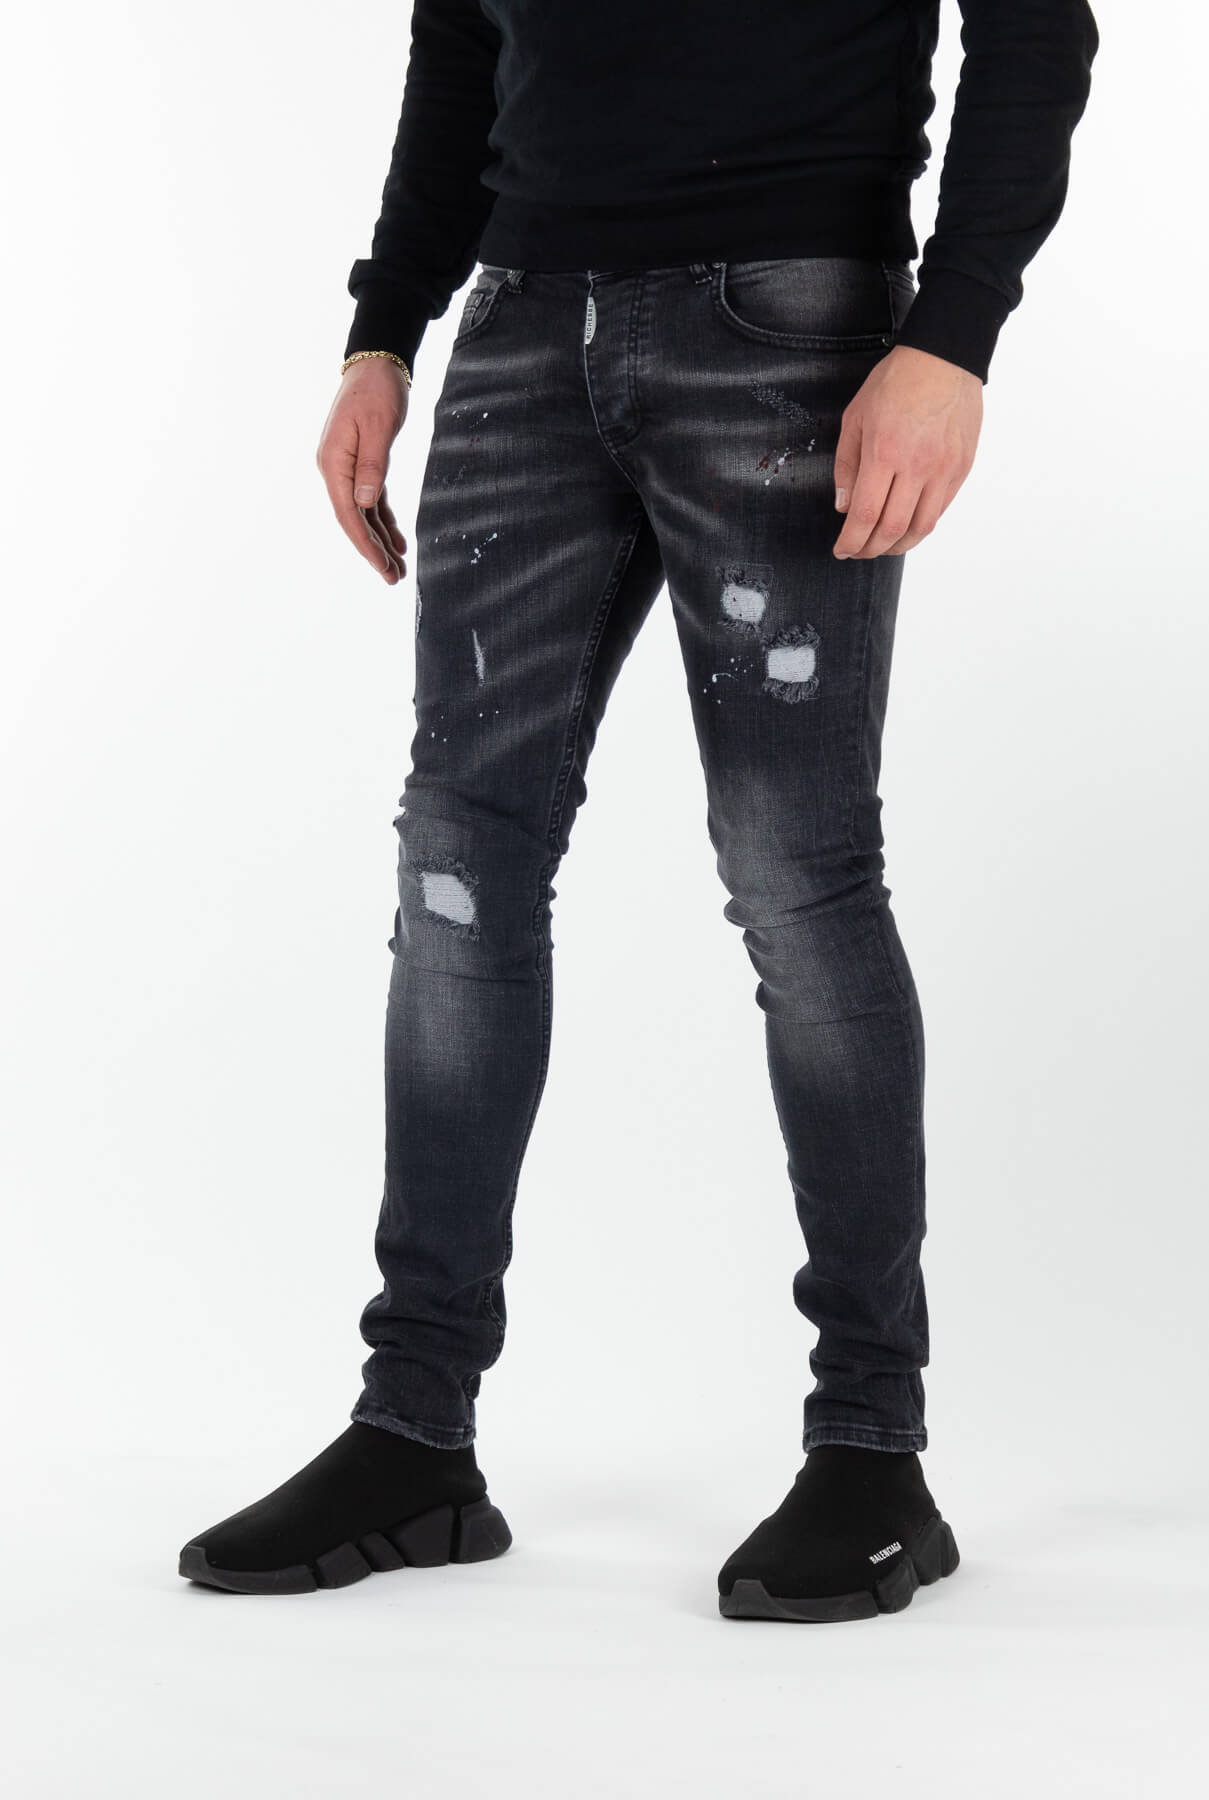 Sevilla Deluxe Dark Jeans-3